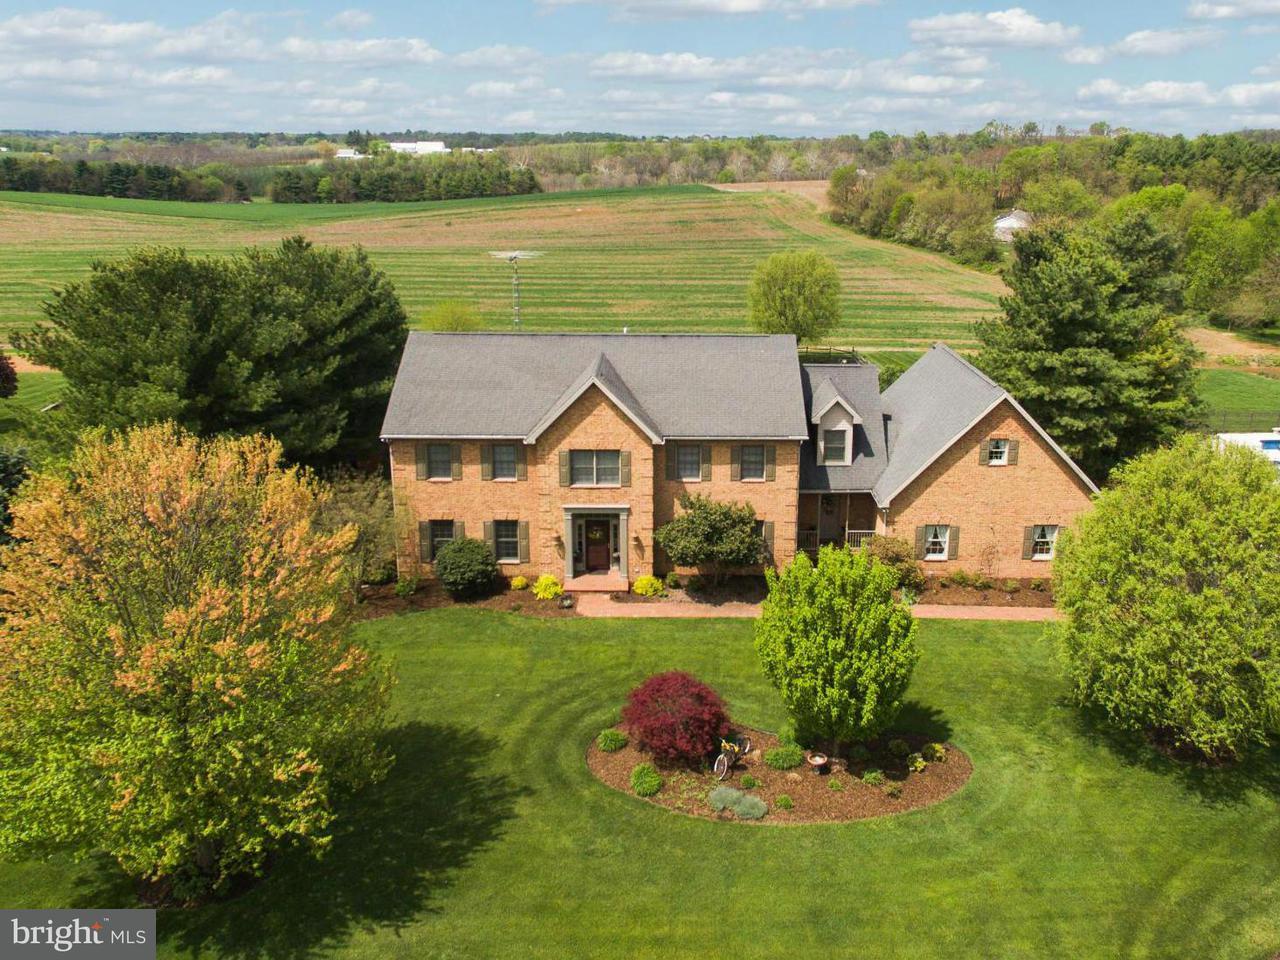 獨棟家庭住宅 為 出售 在 22342 DURBERRY Road 22342 DURBERRY Road Smithsburg, 馬里蘭州 21783 美國